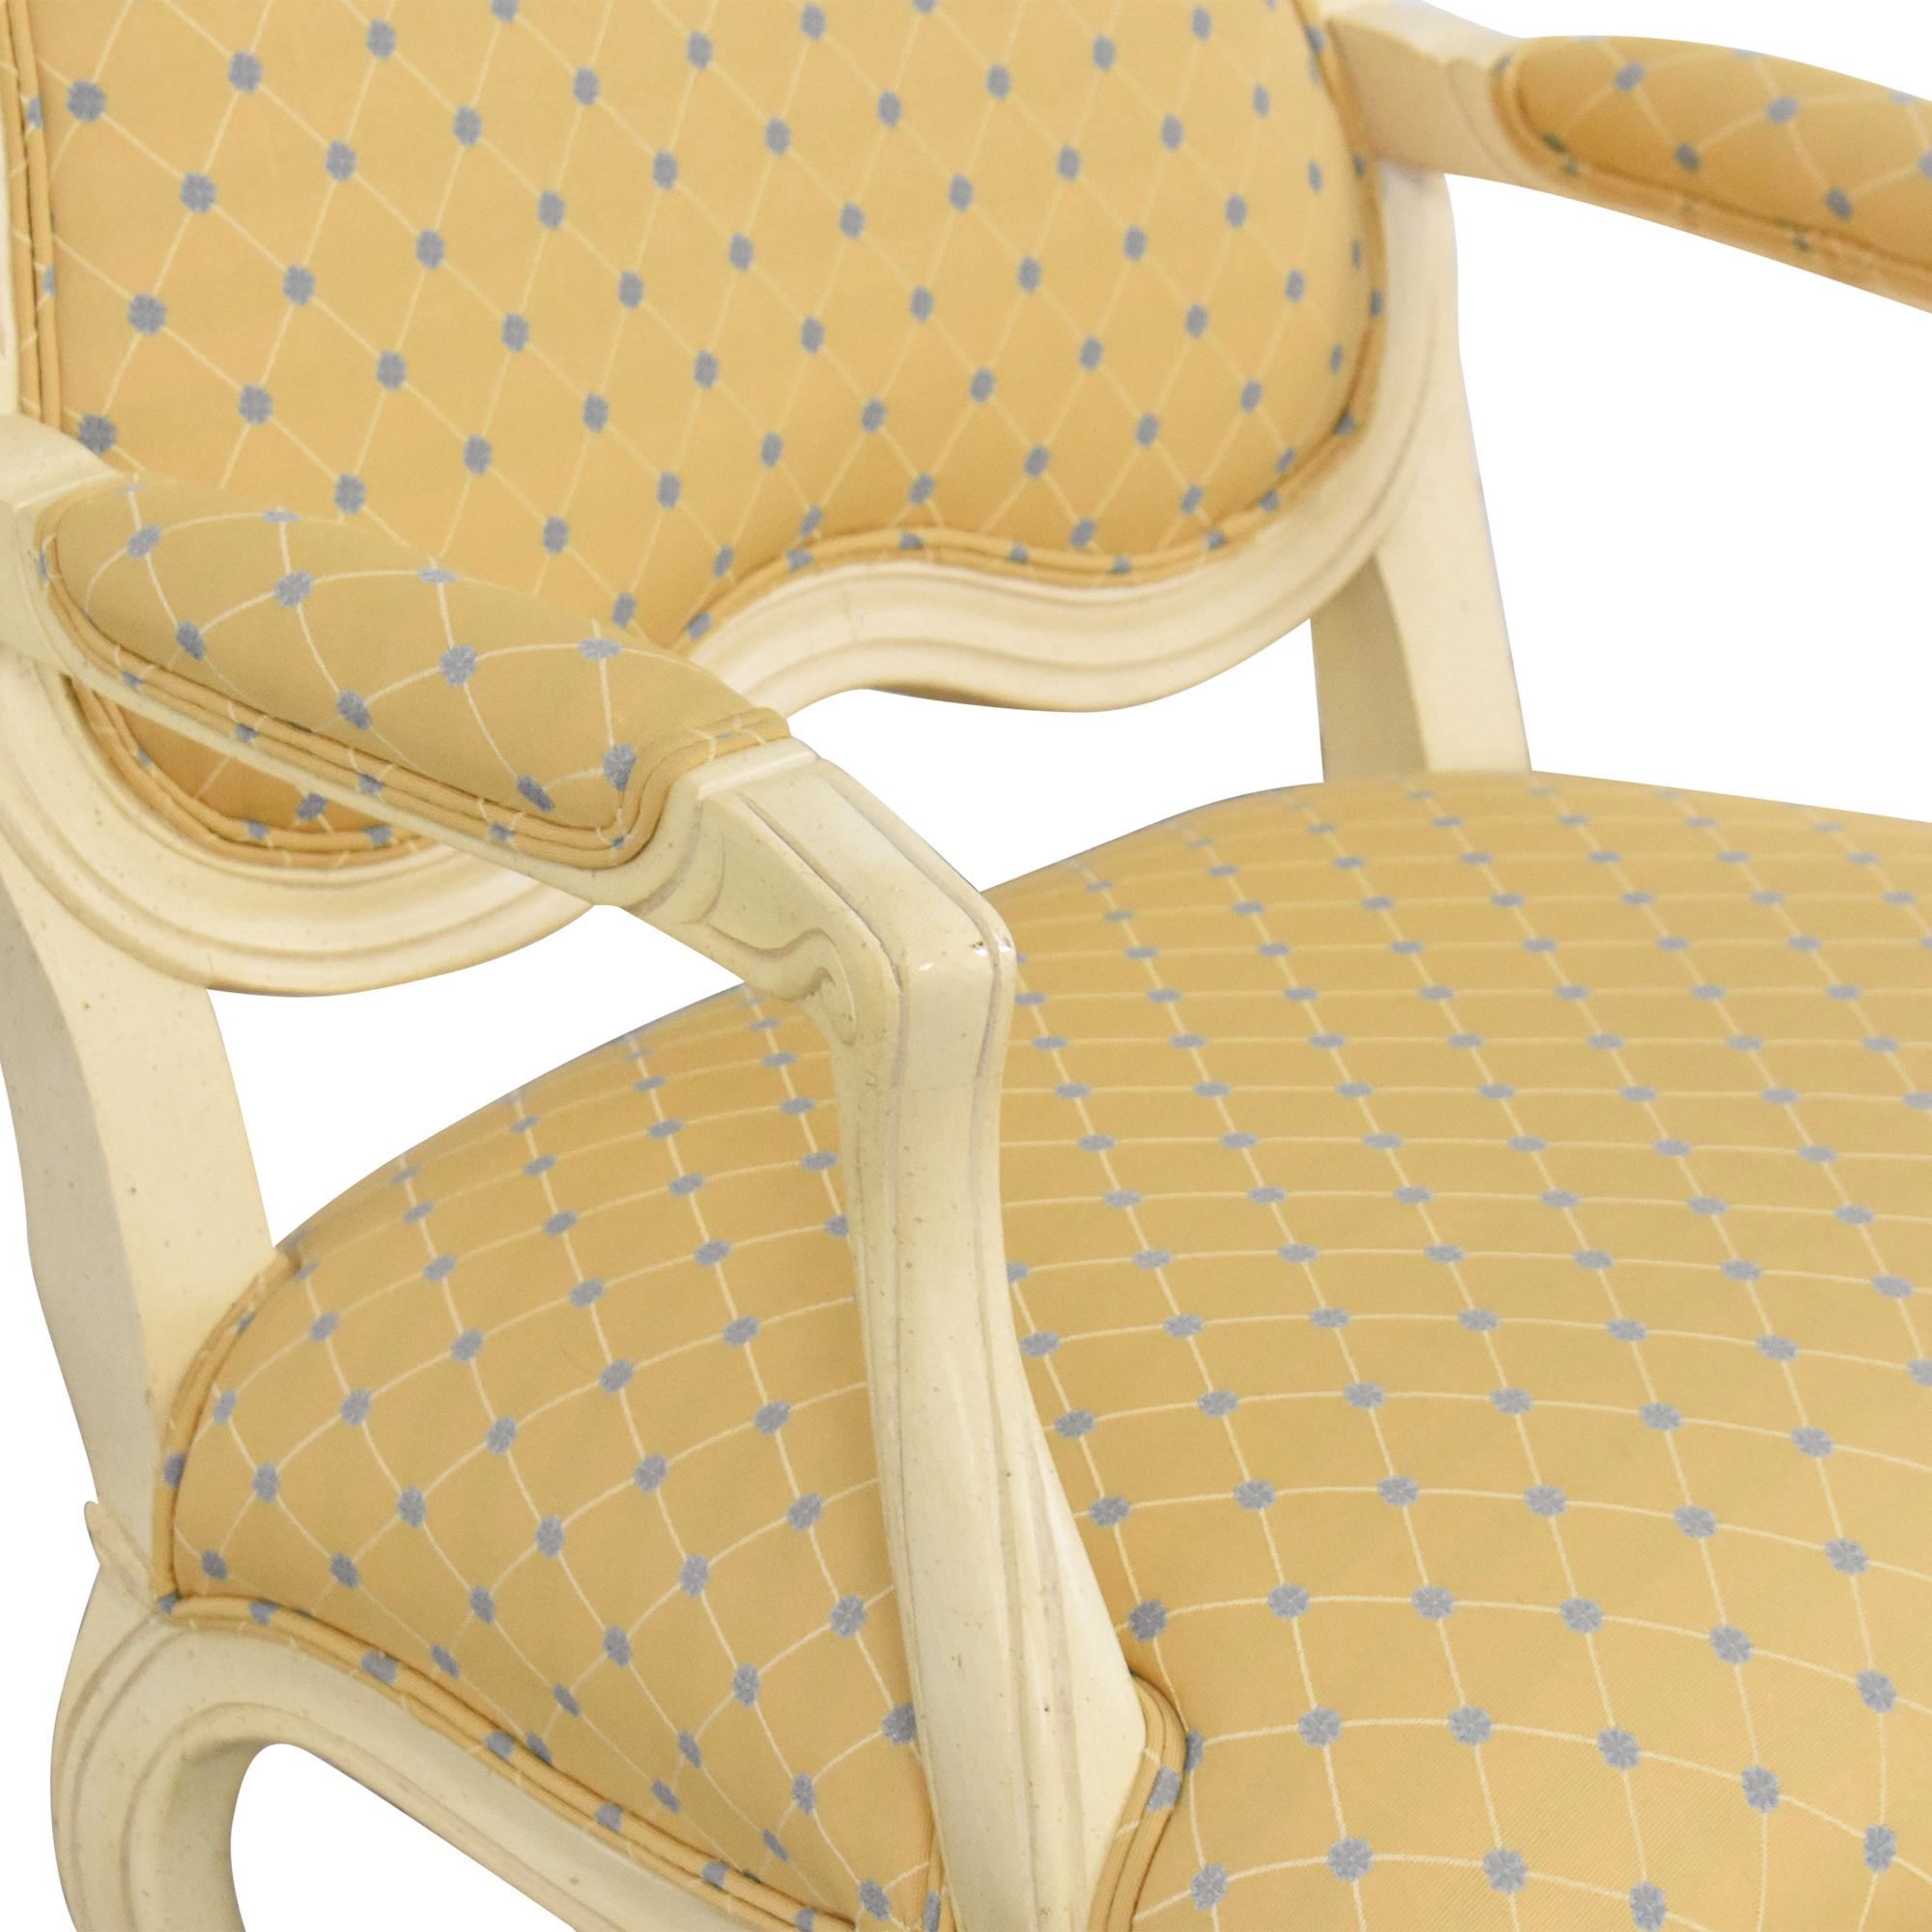 Ethan Allen Ethan Allen Chantel Chair on sale